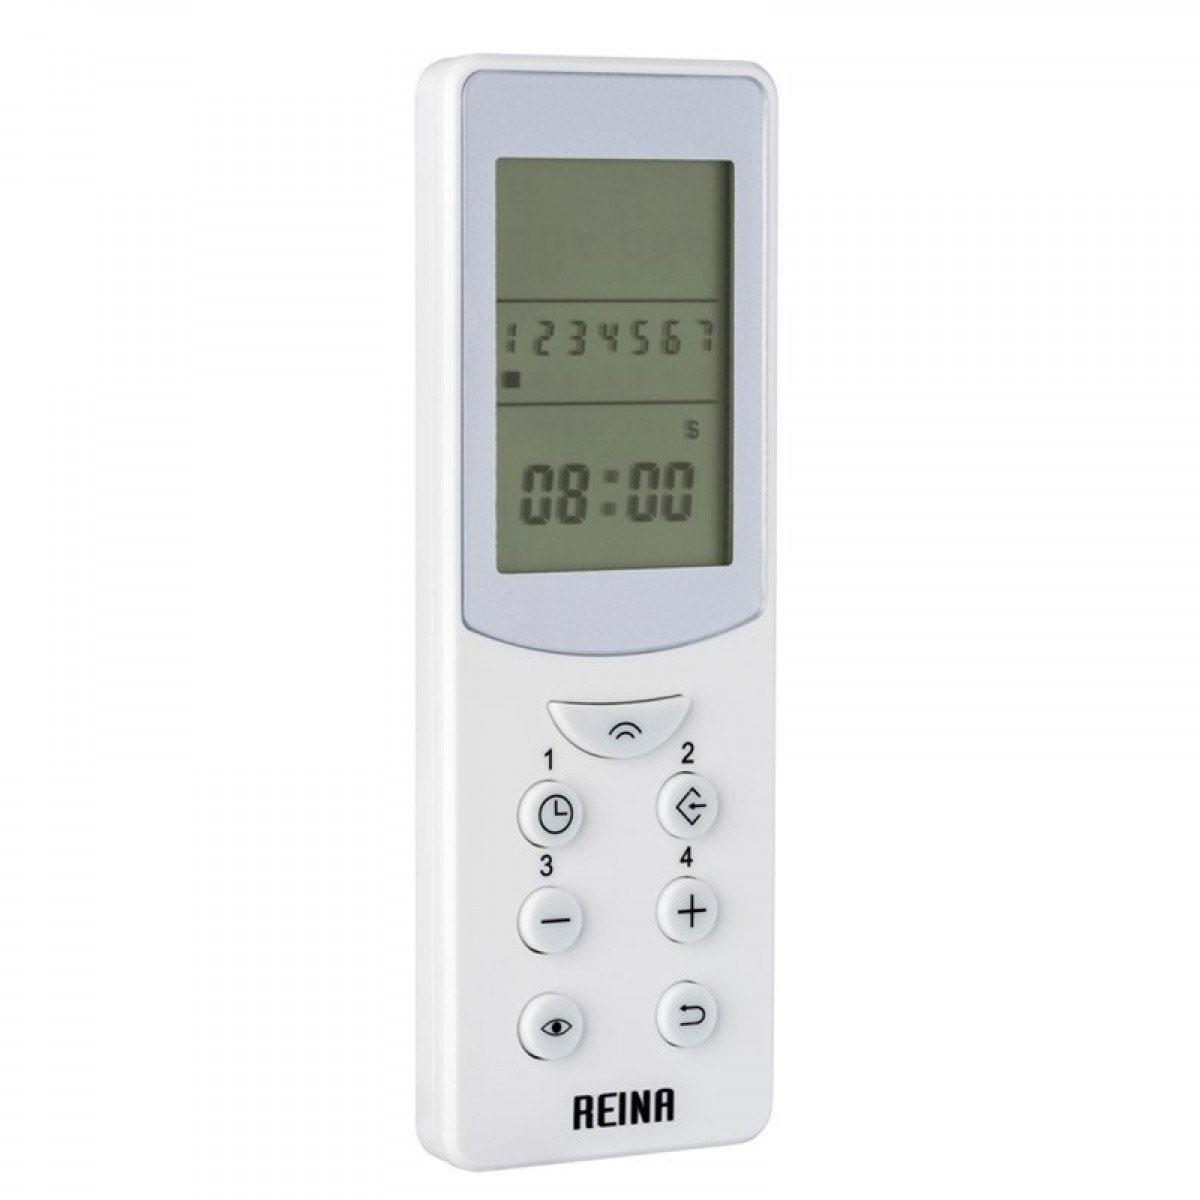 Reina Diva Thermostatic Electric Straight Heated Towel Rail 800mm H x 750mm W Chrome-1